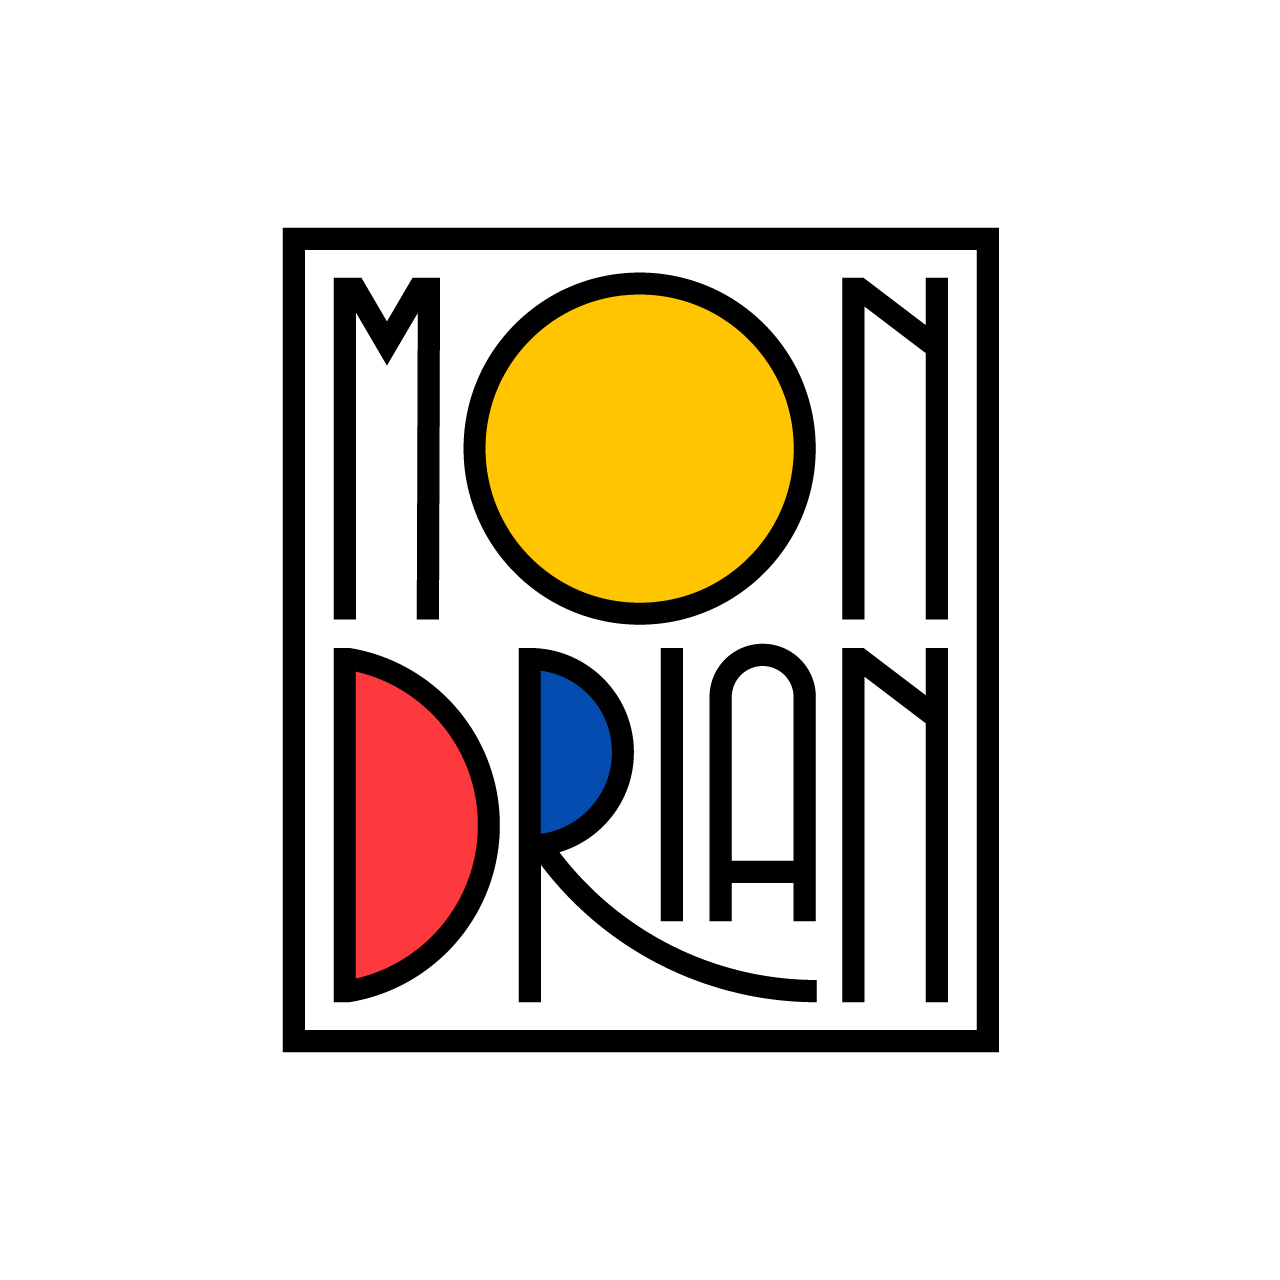 Rafael Serra创意字体设计作品